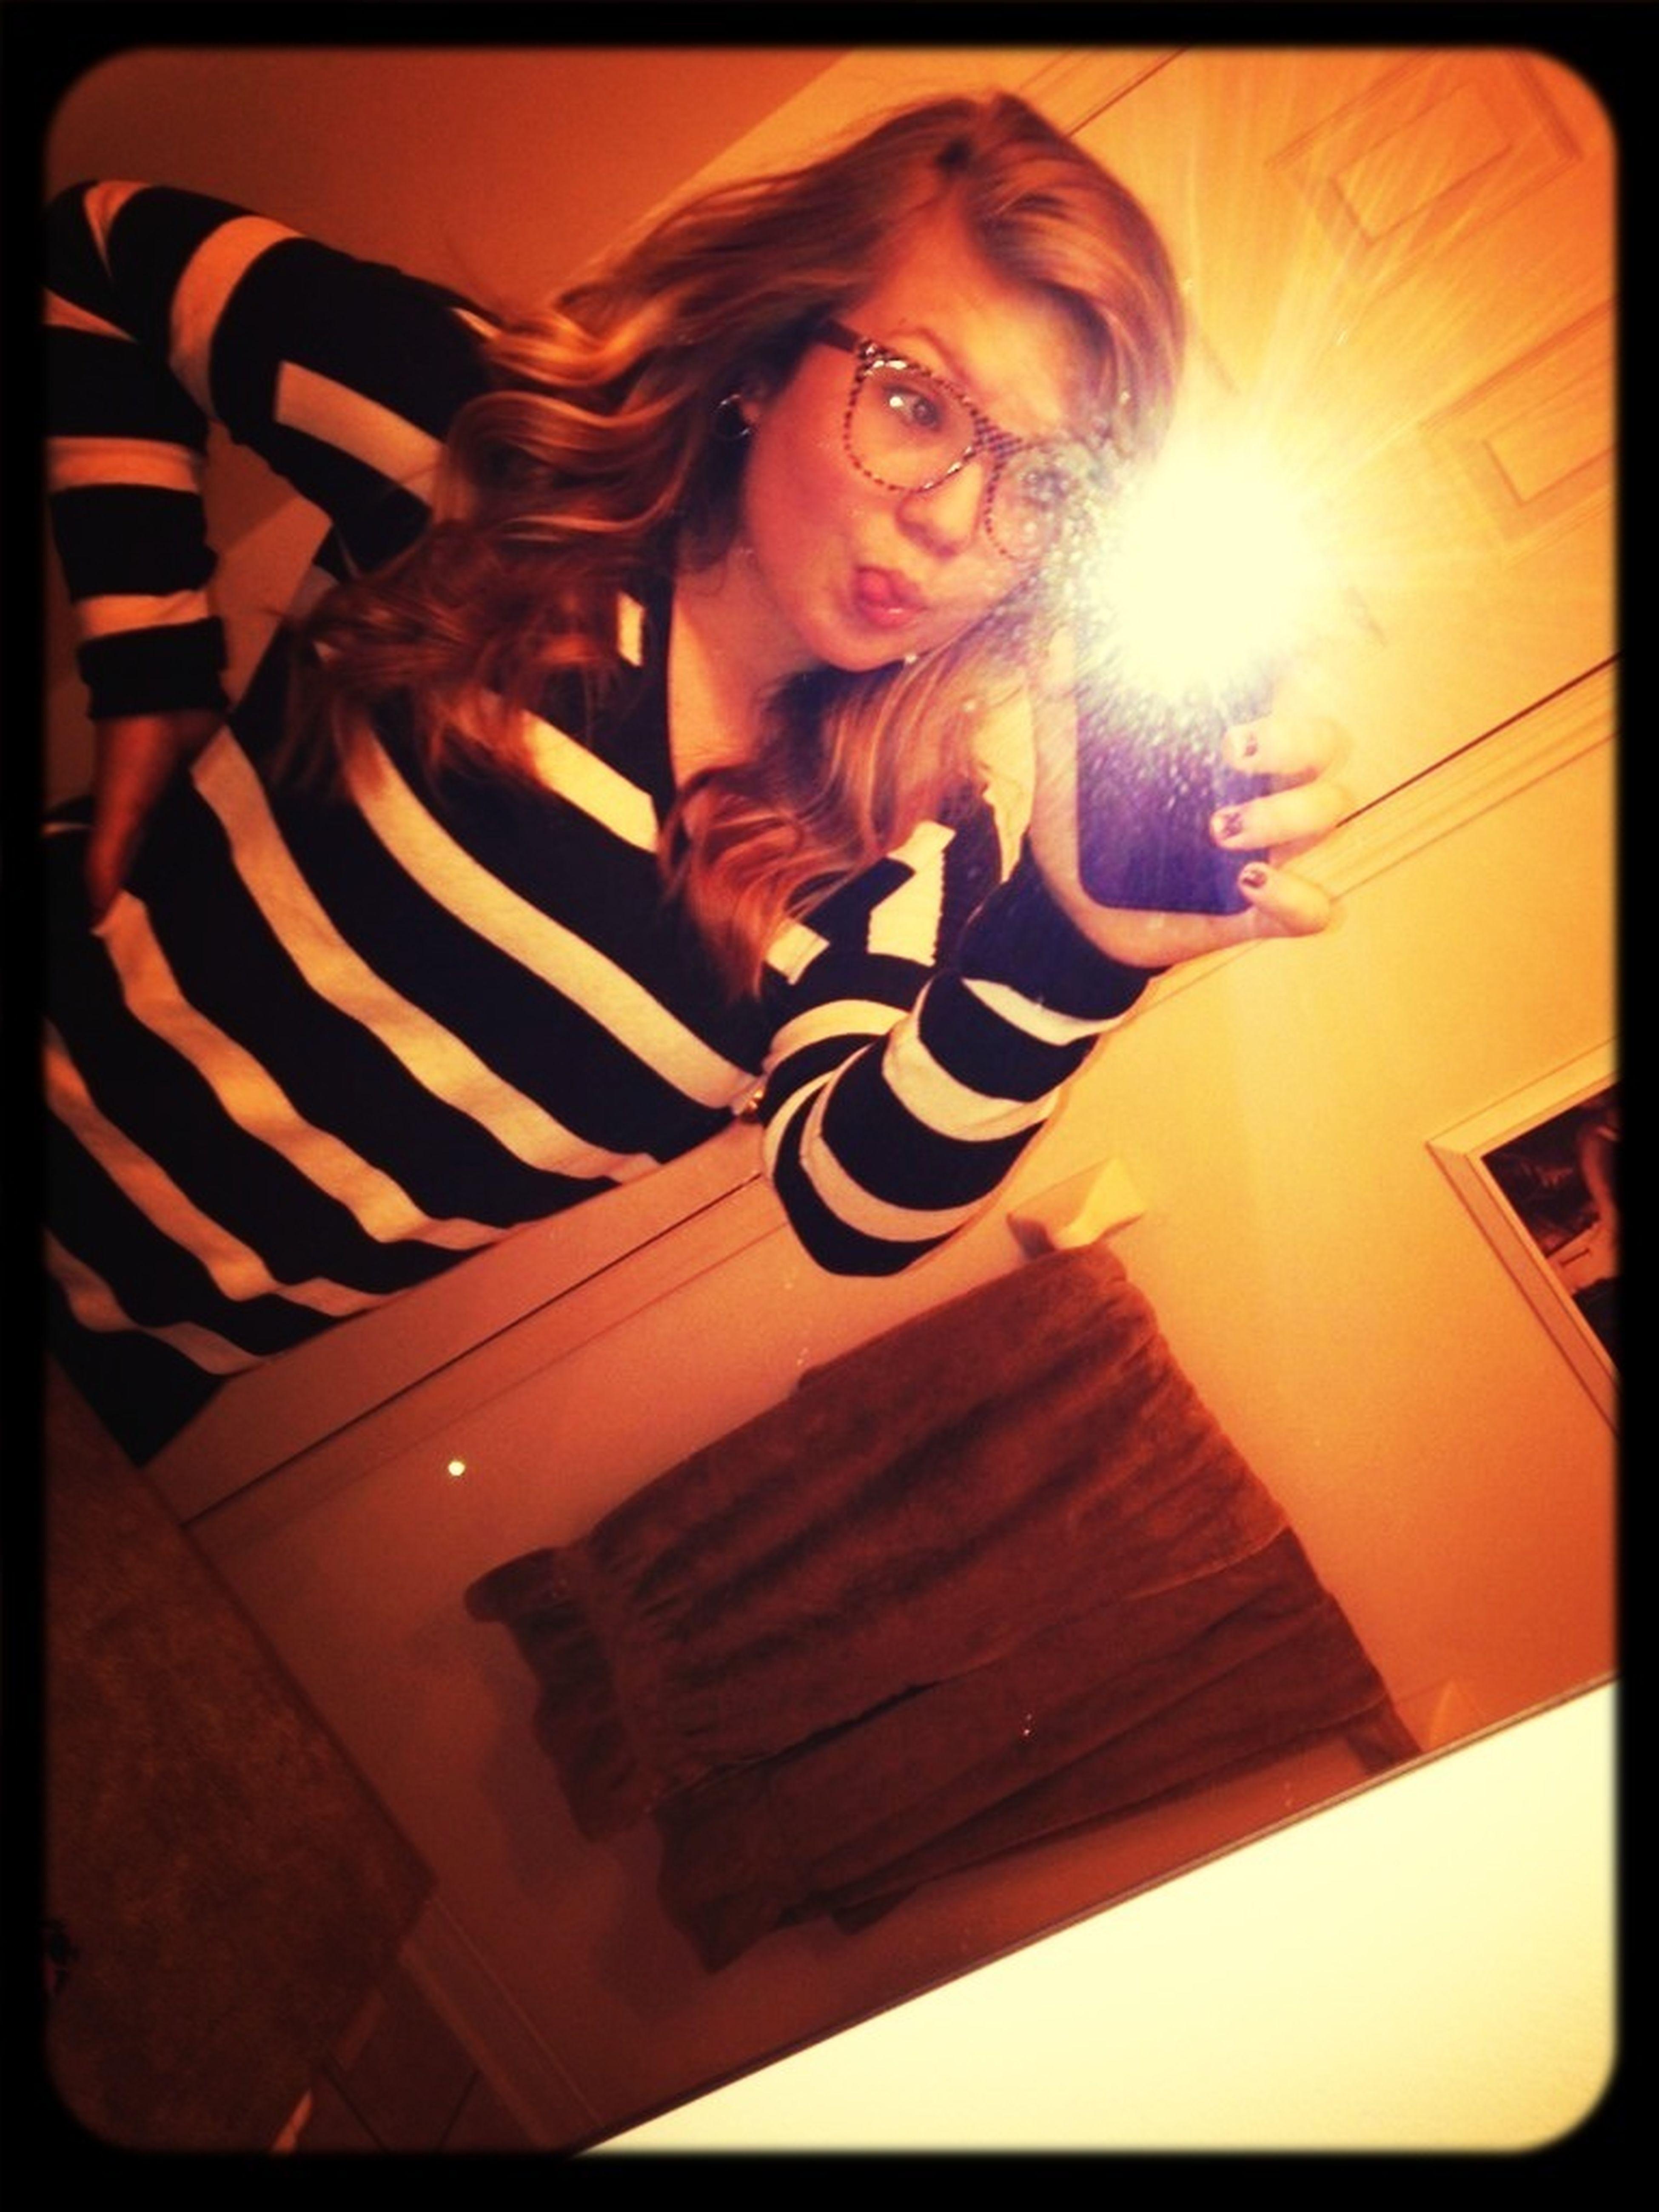 My Nerd Glasses